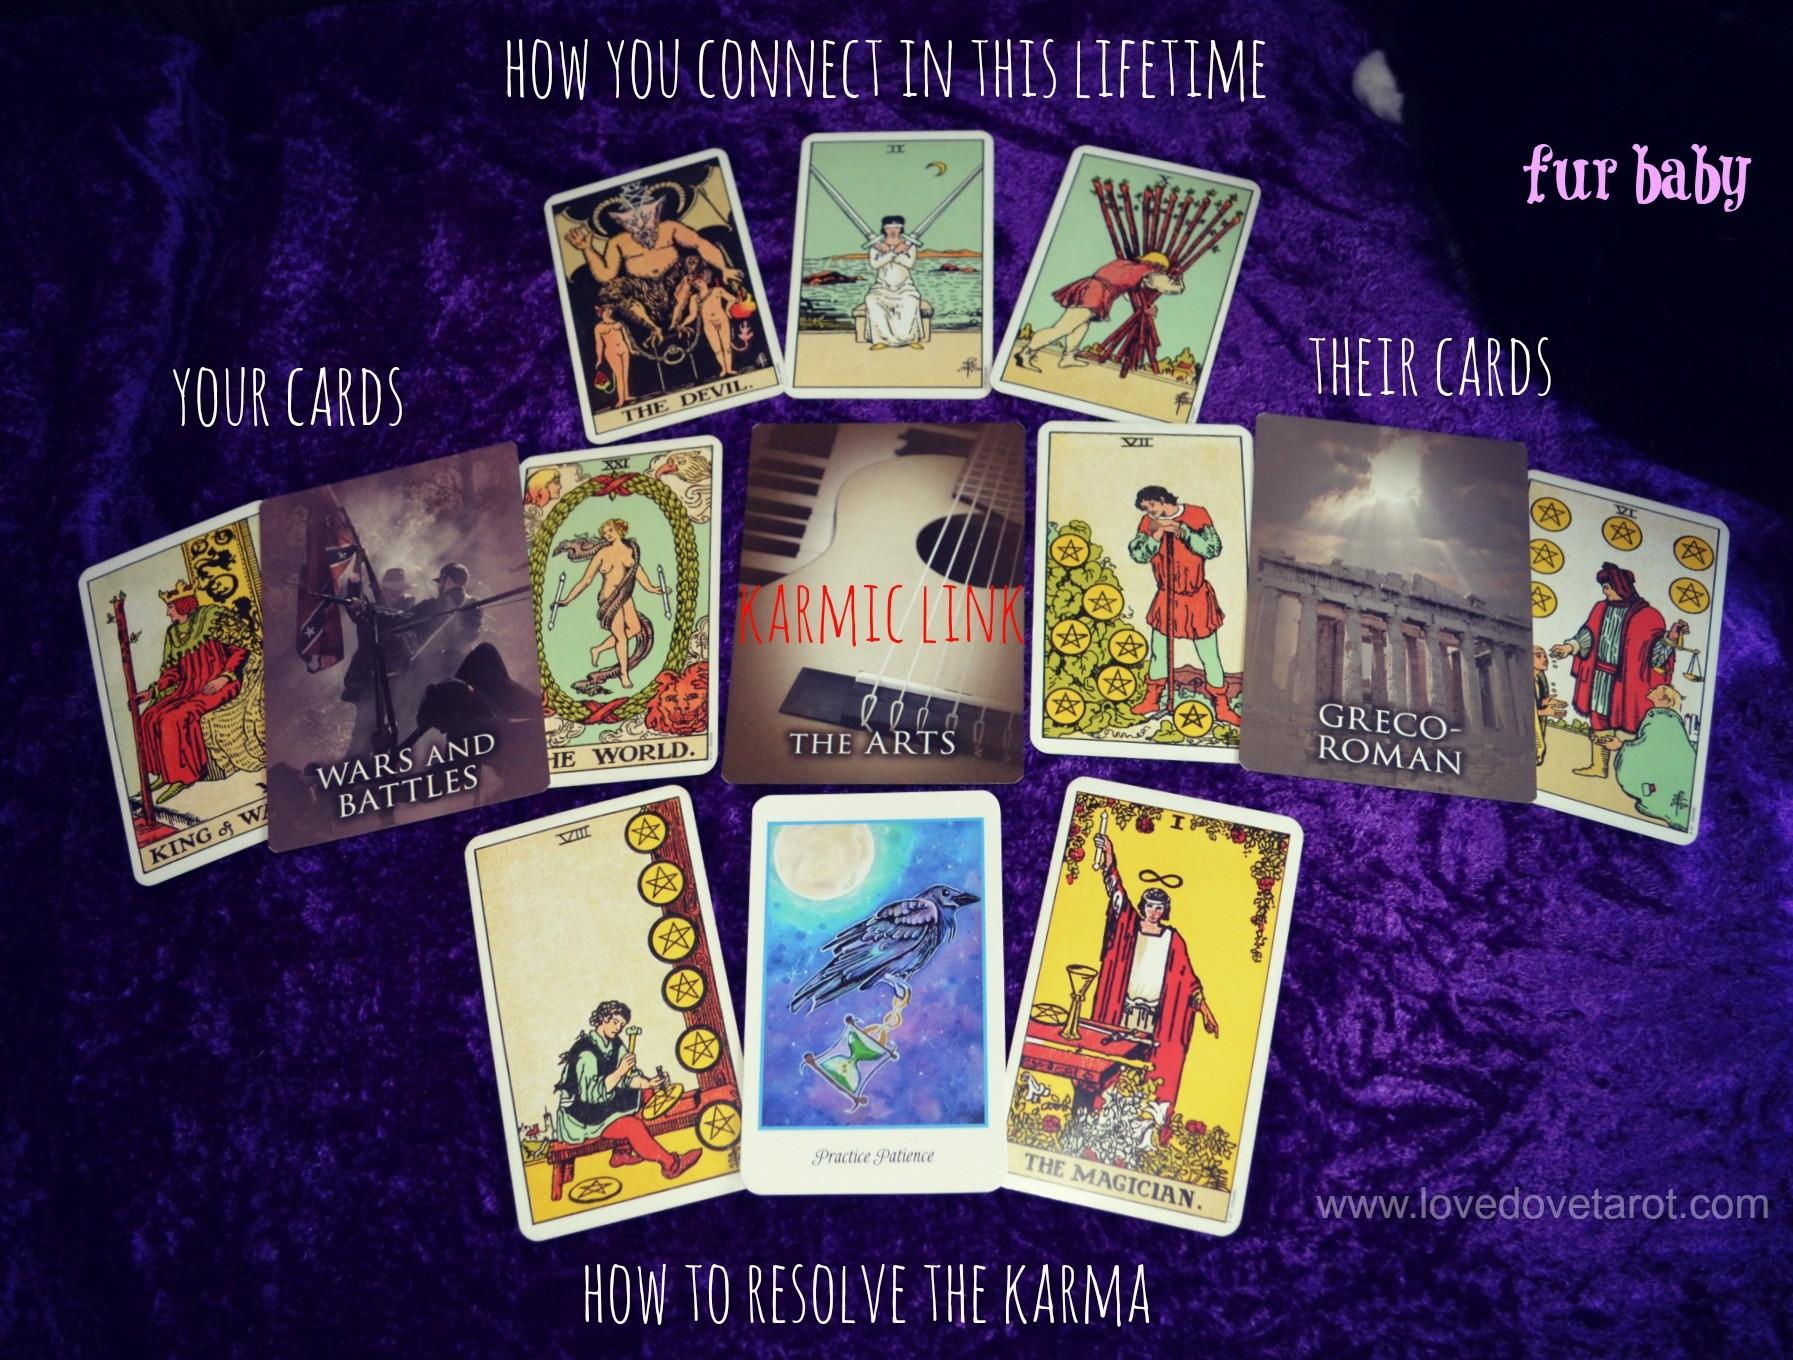 The karmic relationship tarot spread angelorum tarot and healing karmic relationship mixed oracle tarot spread fandeluxe Gallery